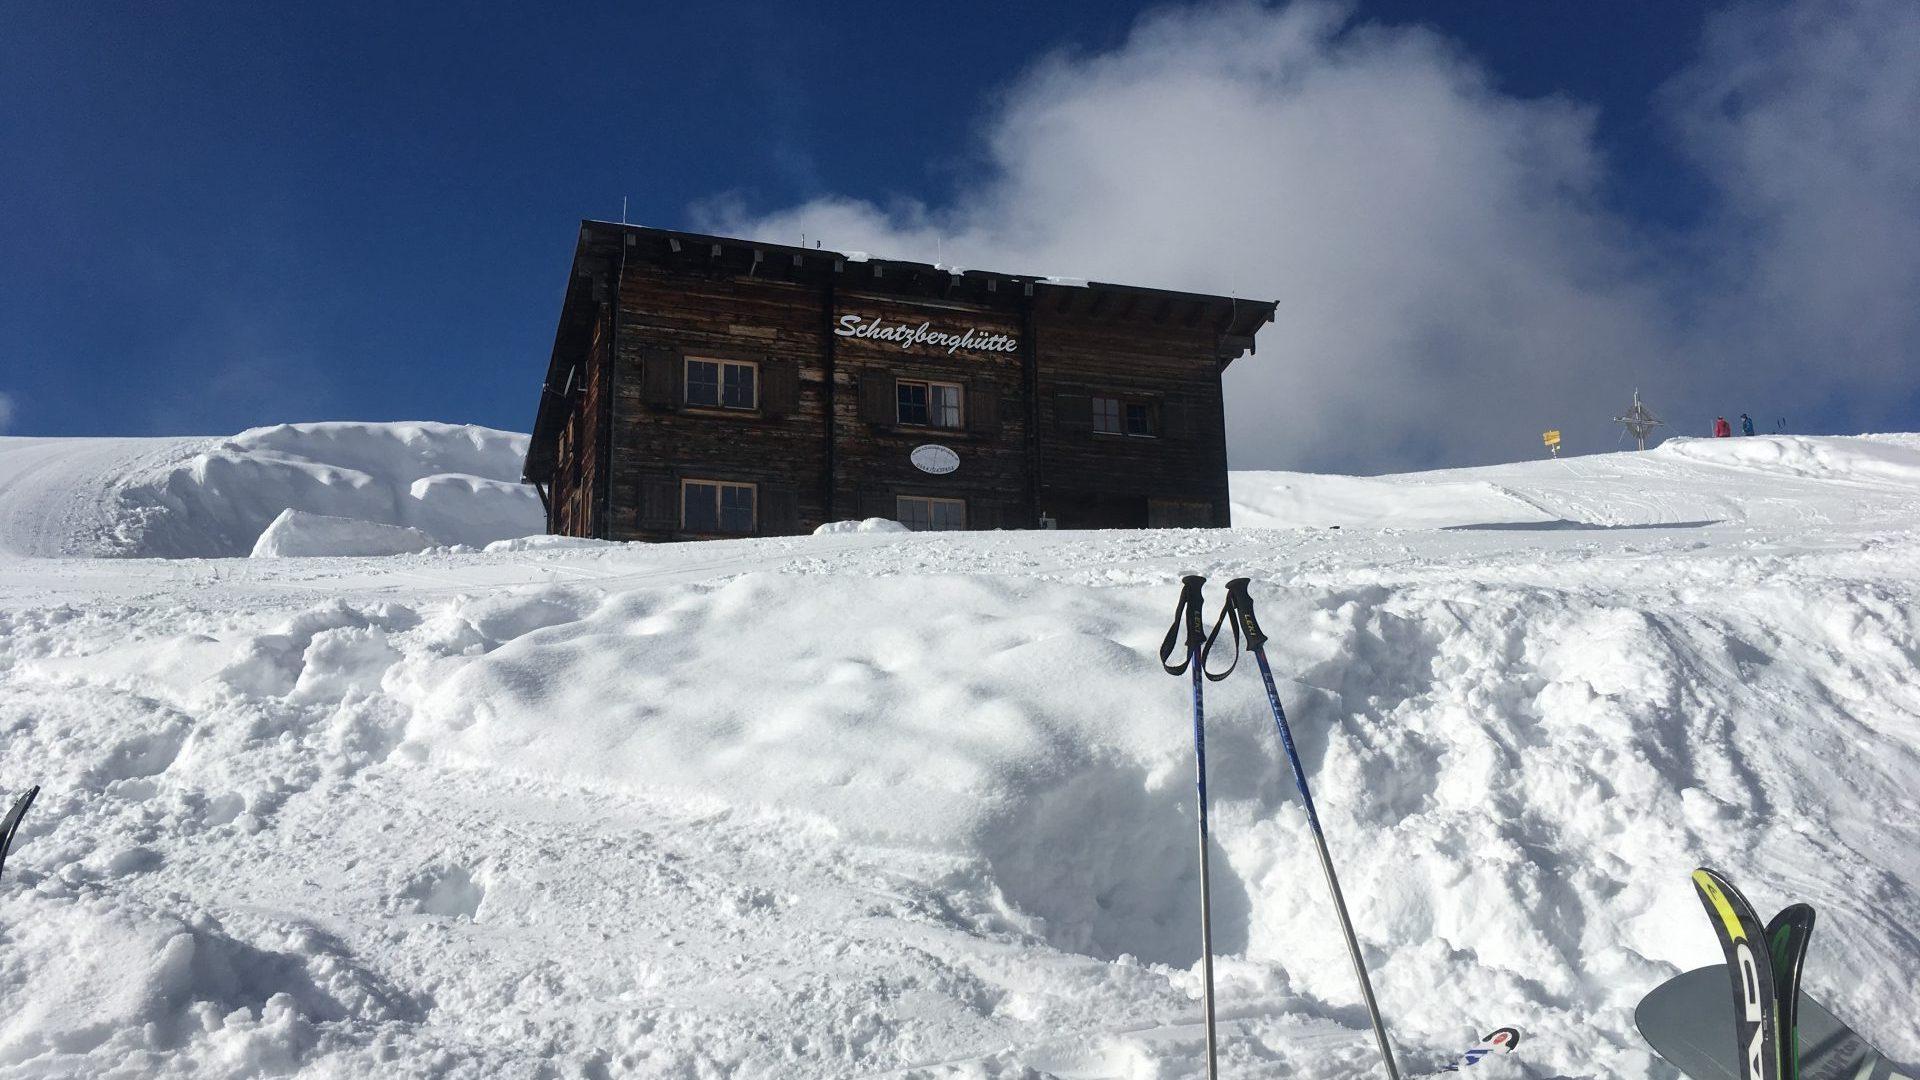 Familienfahrt Mit WSF-Bonus Ins Skijuwel Alpbachtal/Wildschönau